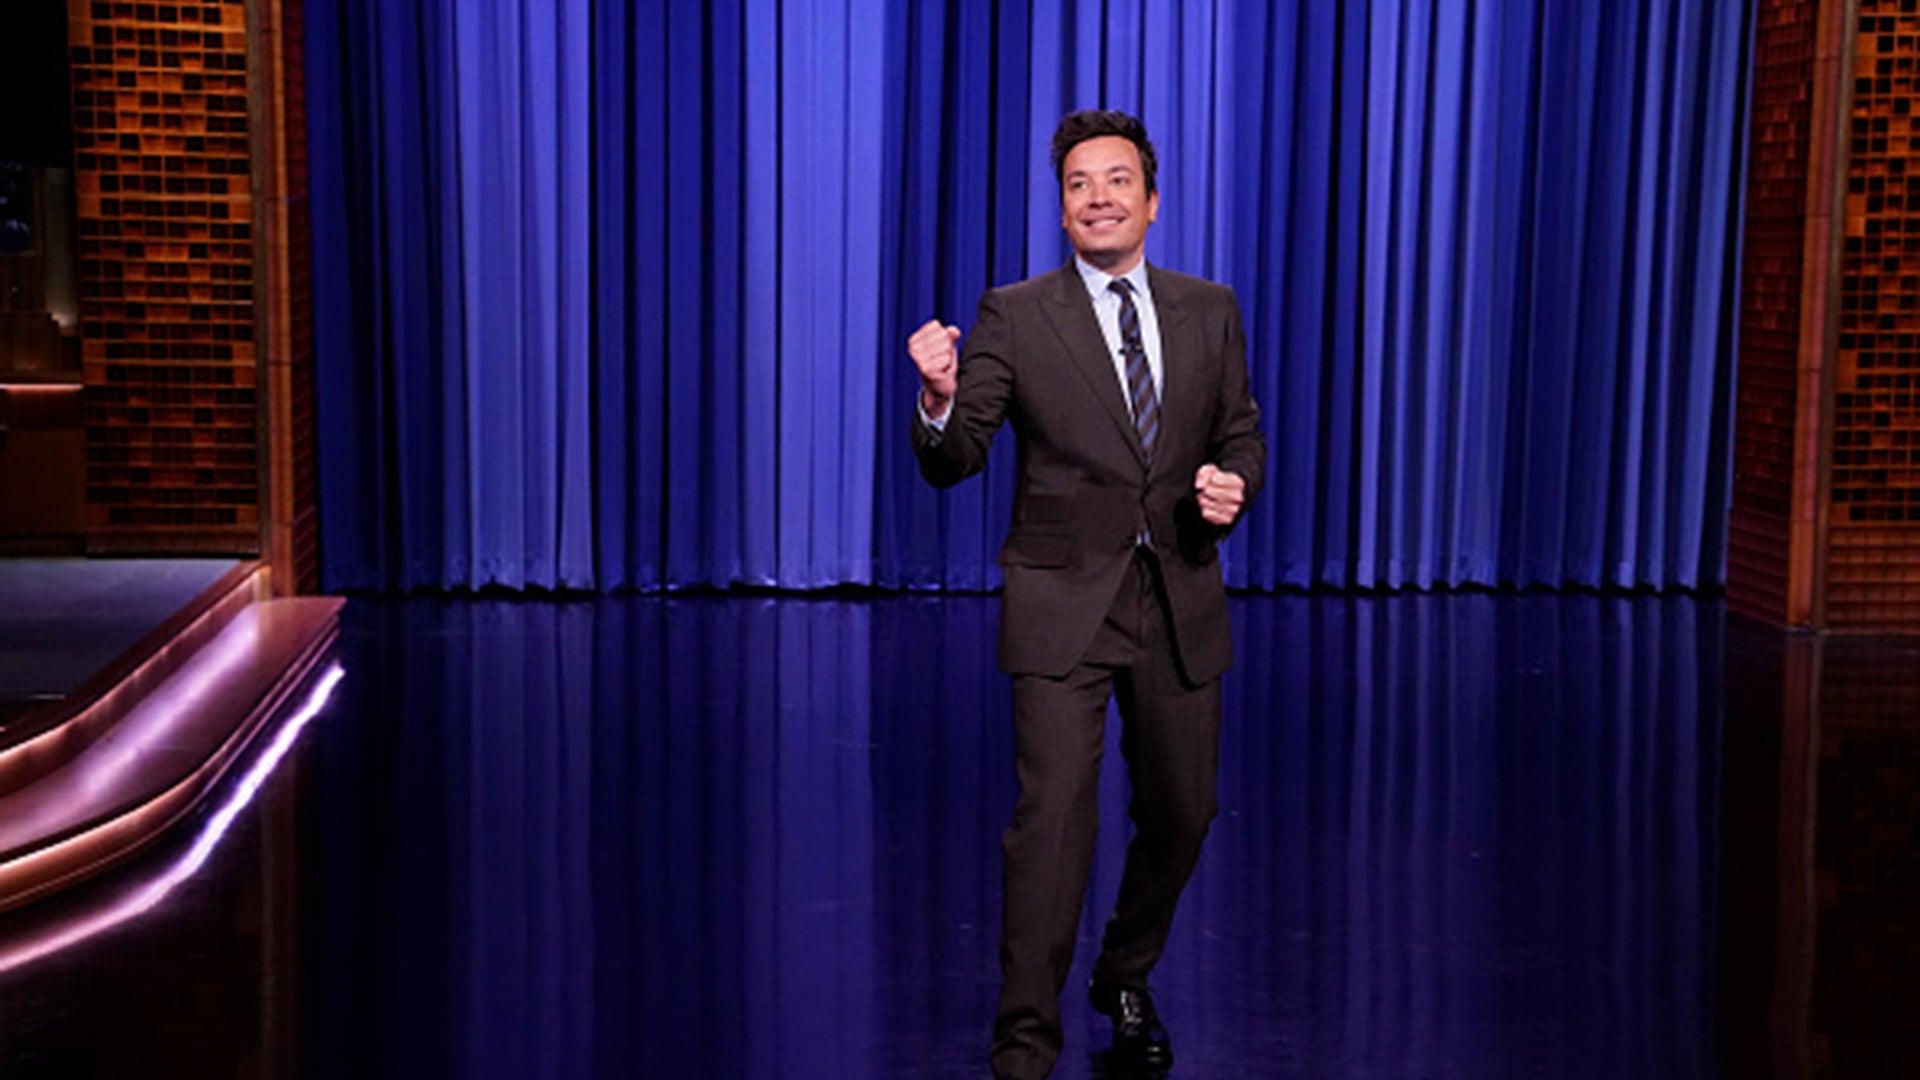 Jimmy Fallon, The Tonight Show Starring Jimmy Fallon